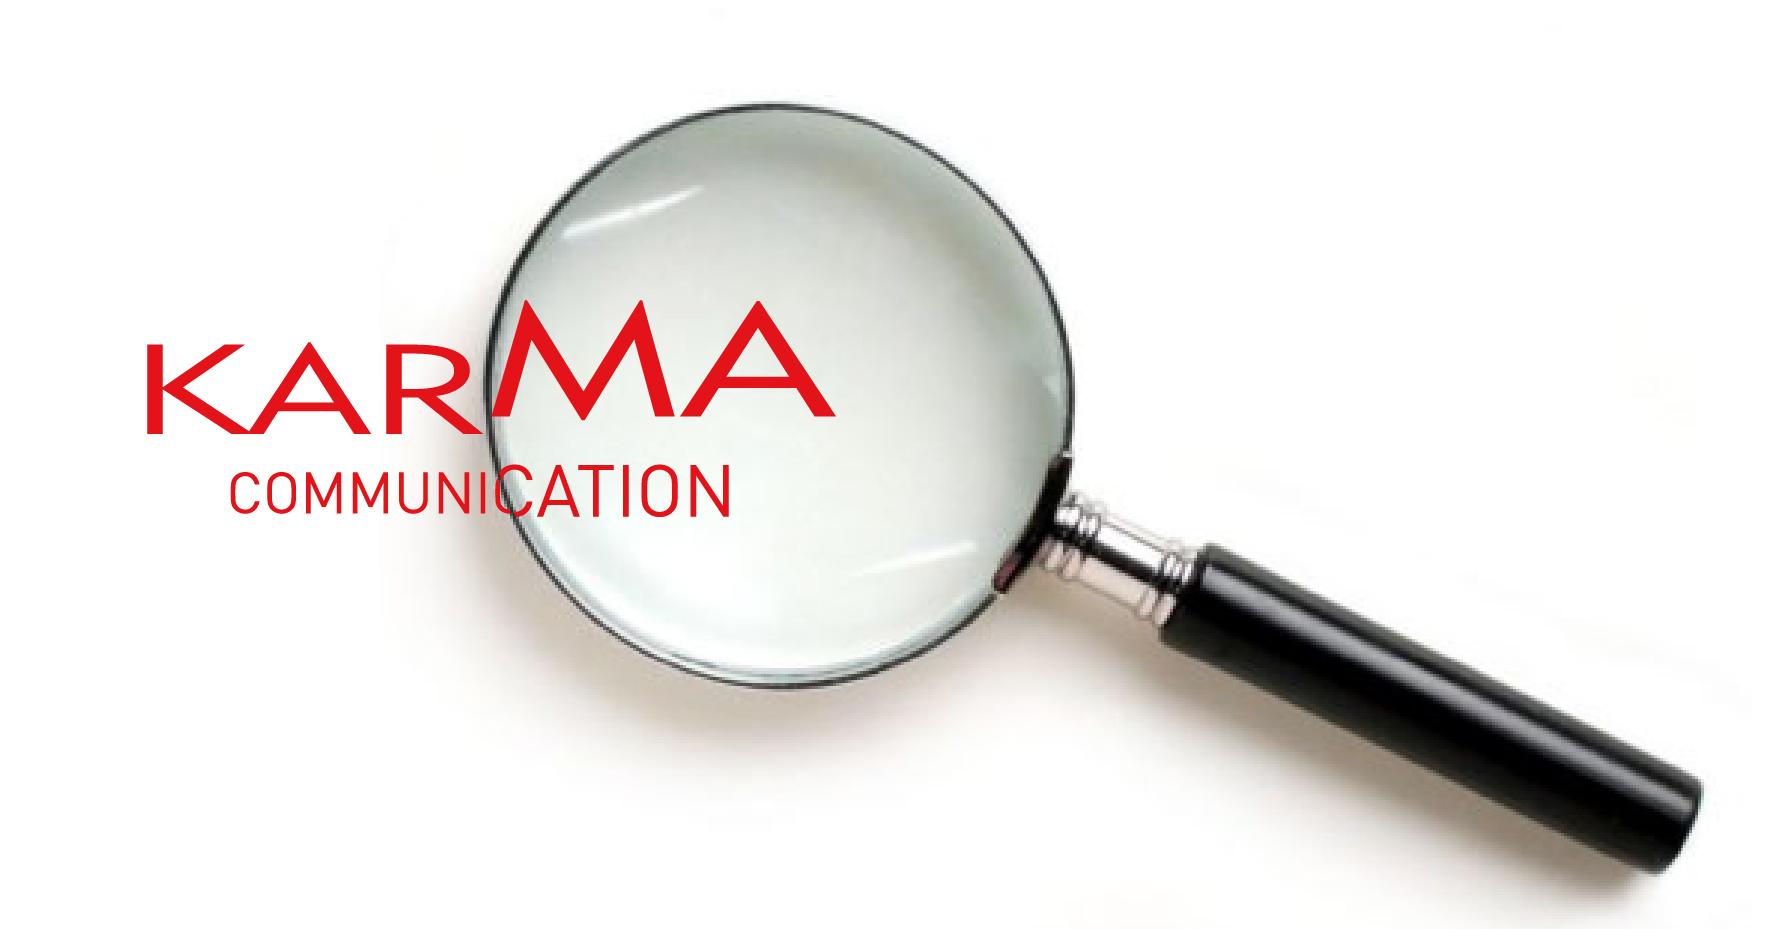 Karma Communication - Le cose che non sapete di Karma Communication